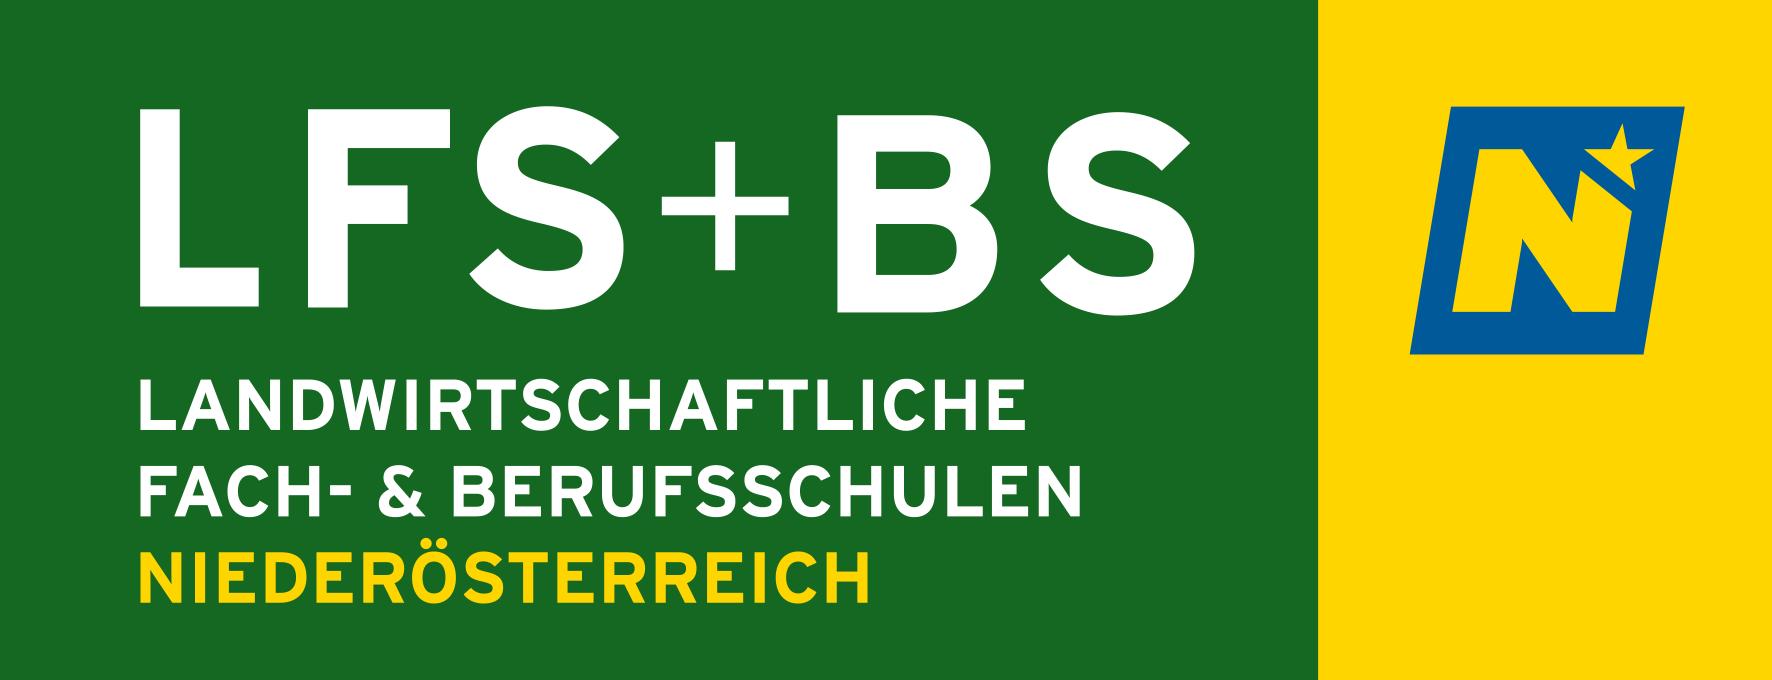 LFS + BS Logo